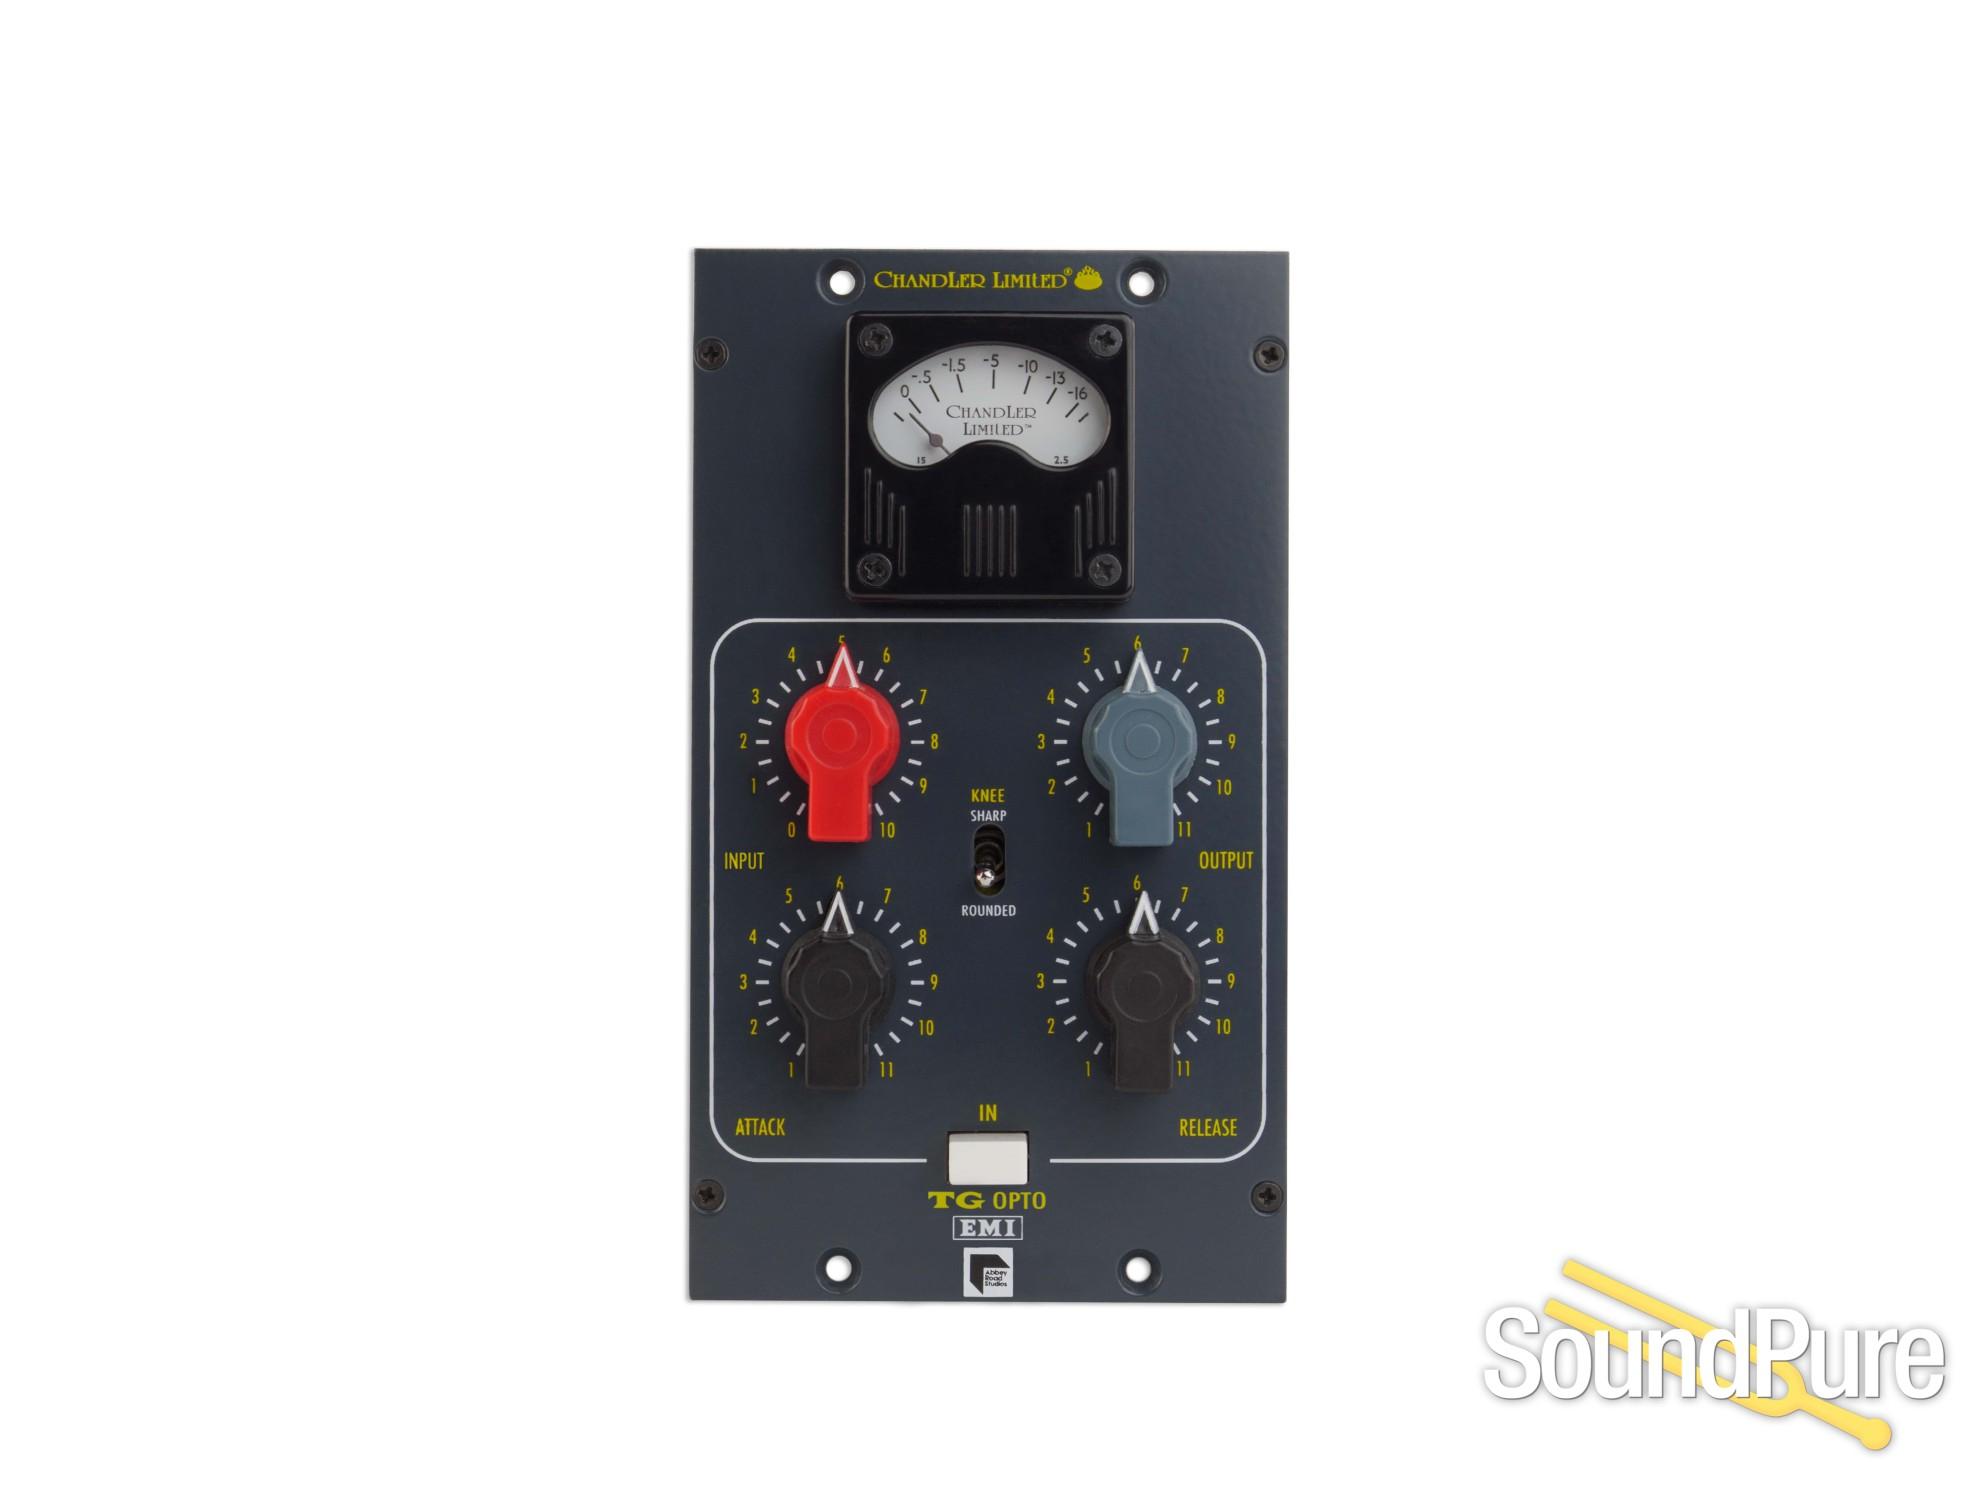 500-Series Dynamics | Soundpure com